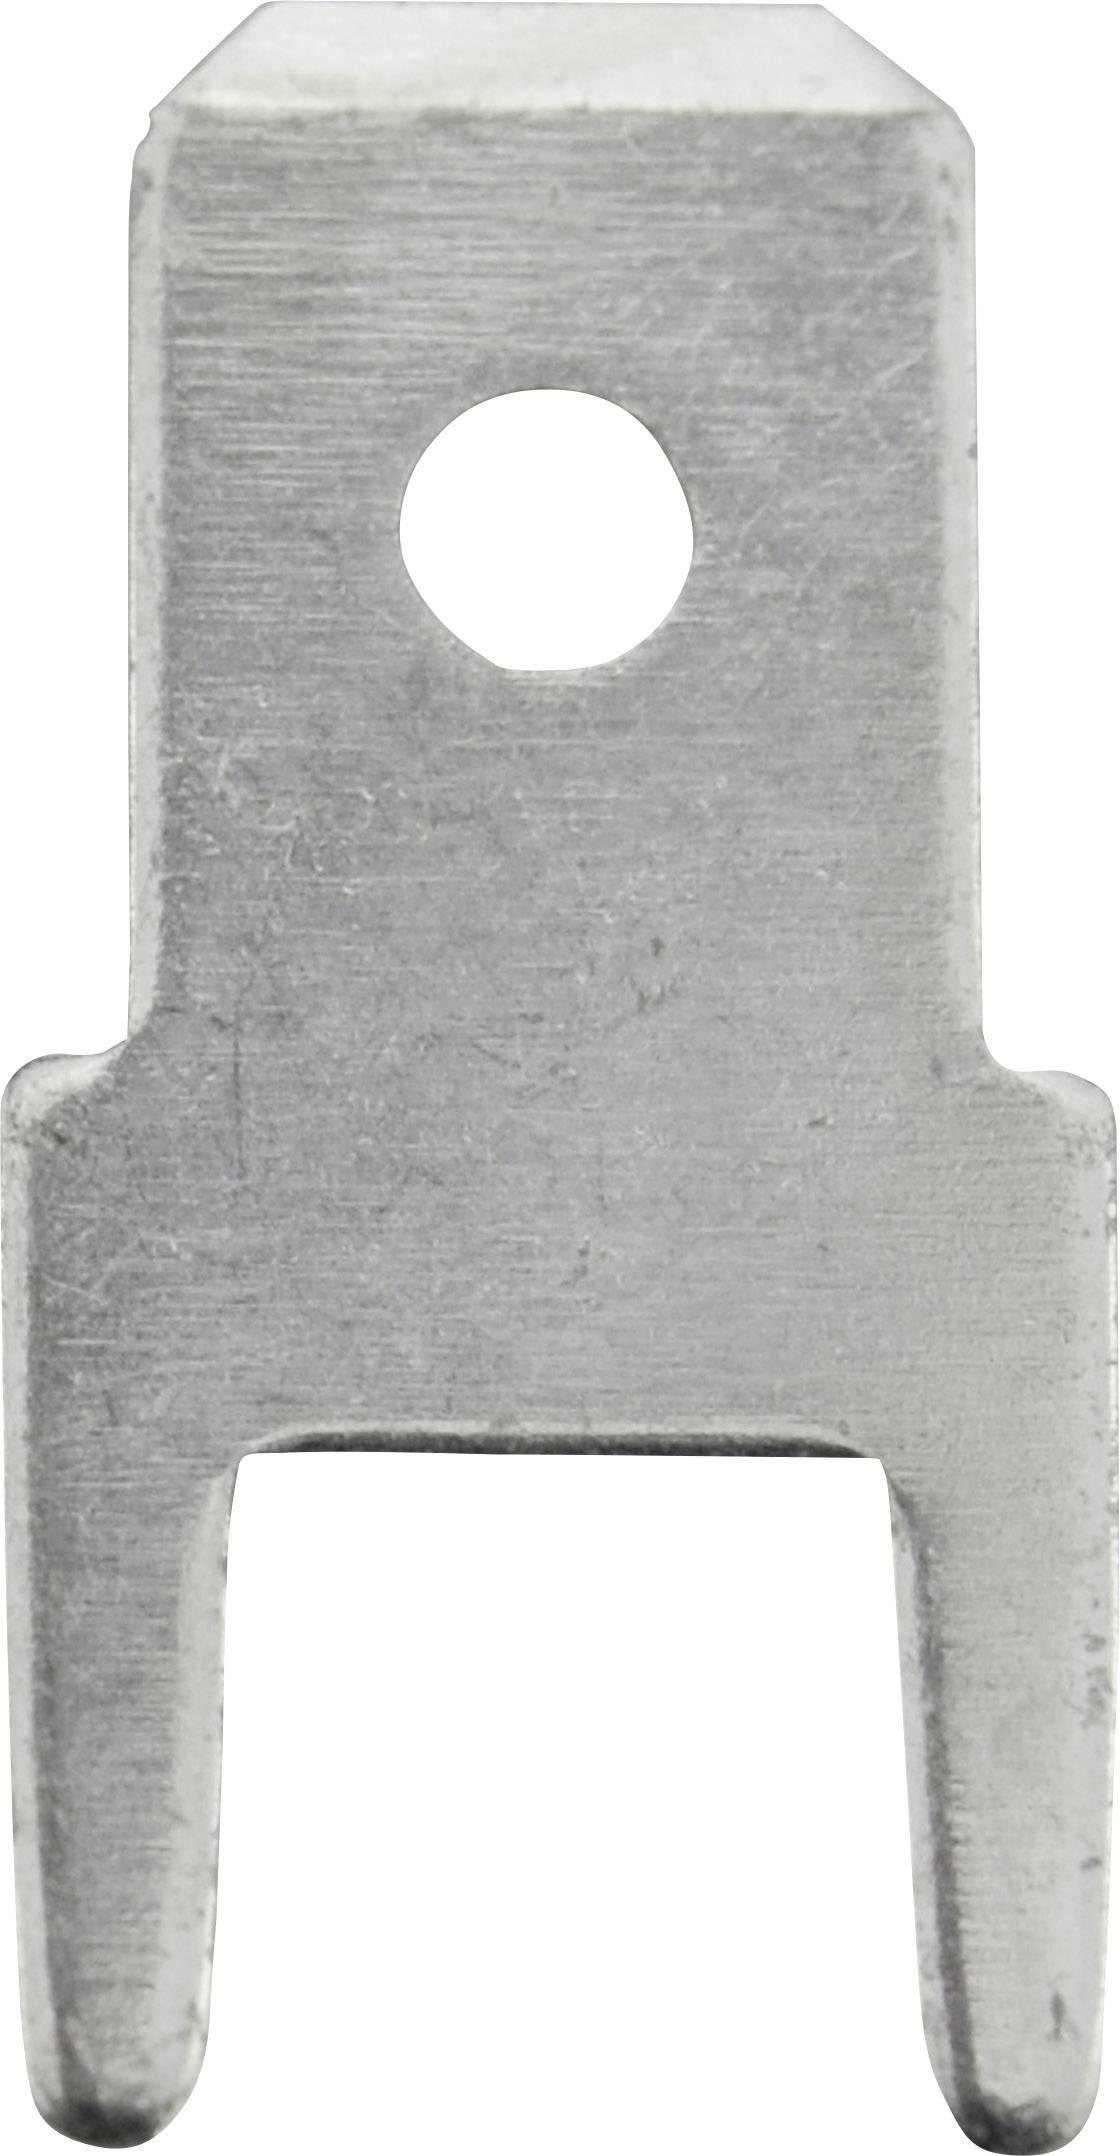 Faston zástrčka Vogt Verbindungstechnik 382505.68 4.8 mm x 0.5 mm, 180 °, bez izolace, kov, 100 ks